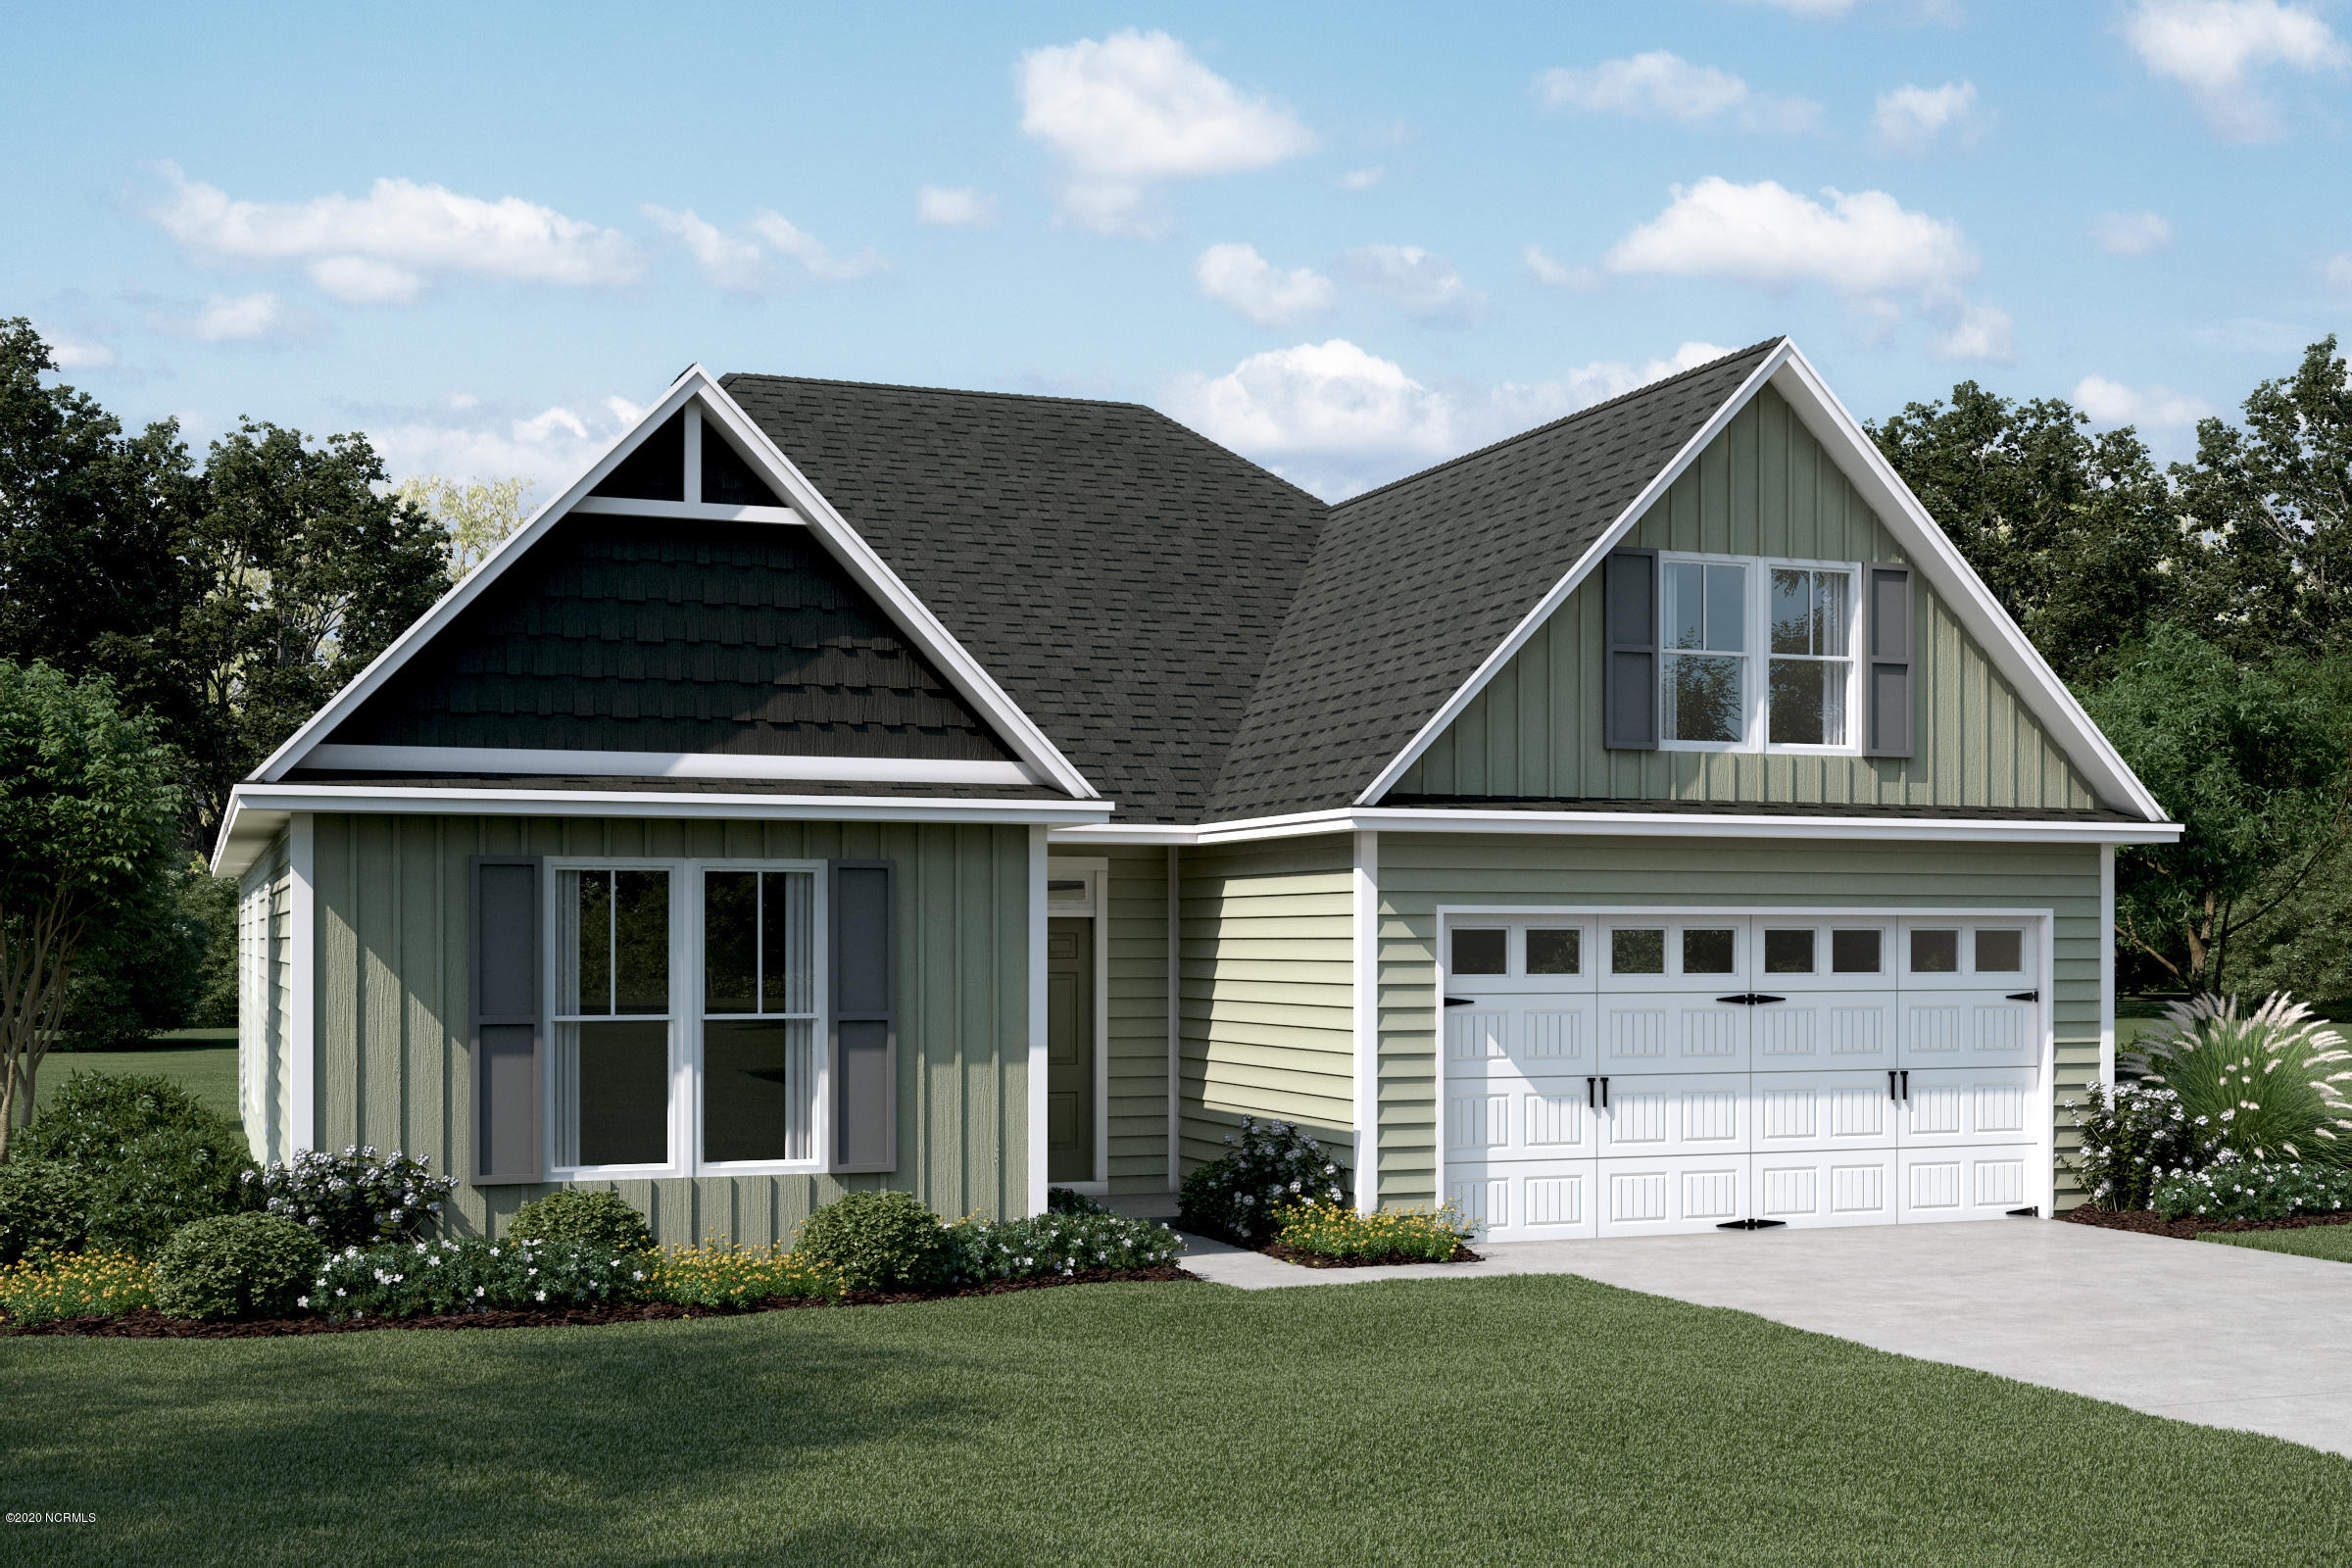 4113 Pegasus Parkway, Leland, North Carolina 28451, 3 Bedrooms Bedrooms, ,2 BathroomsBathrooms,Residential,For Sale,Pegasus,100234600